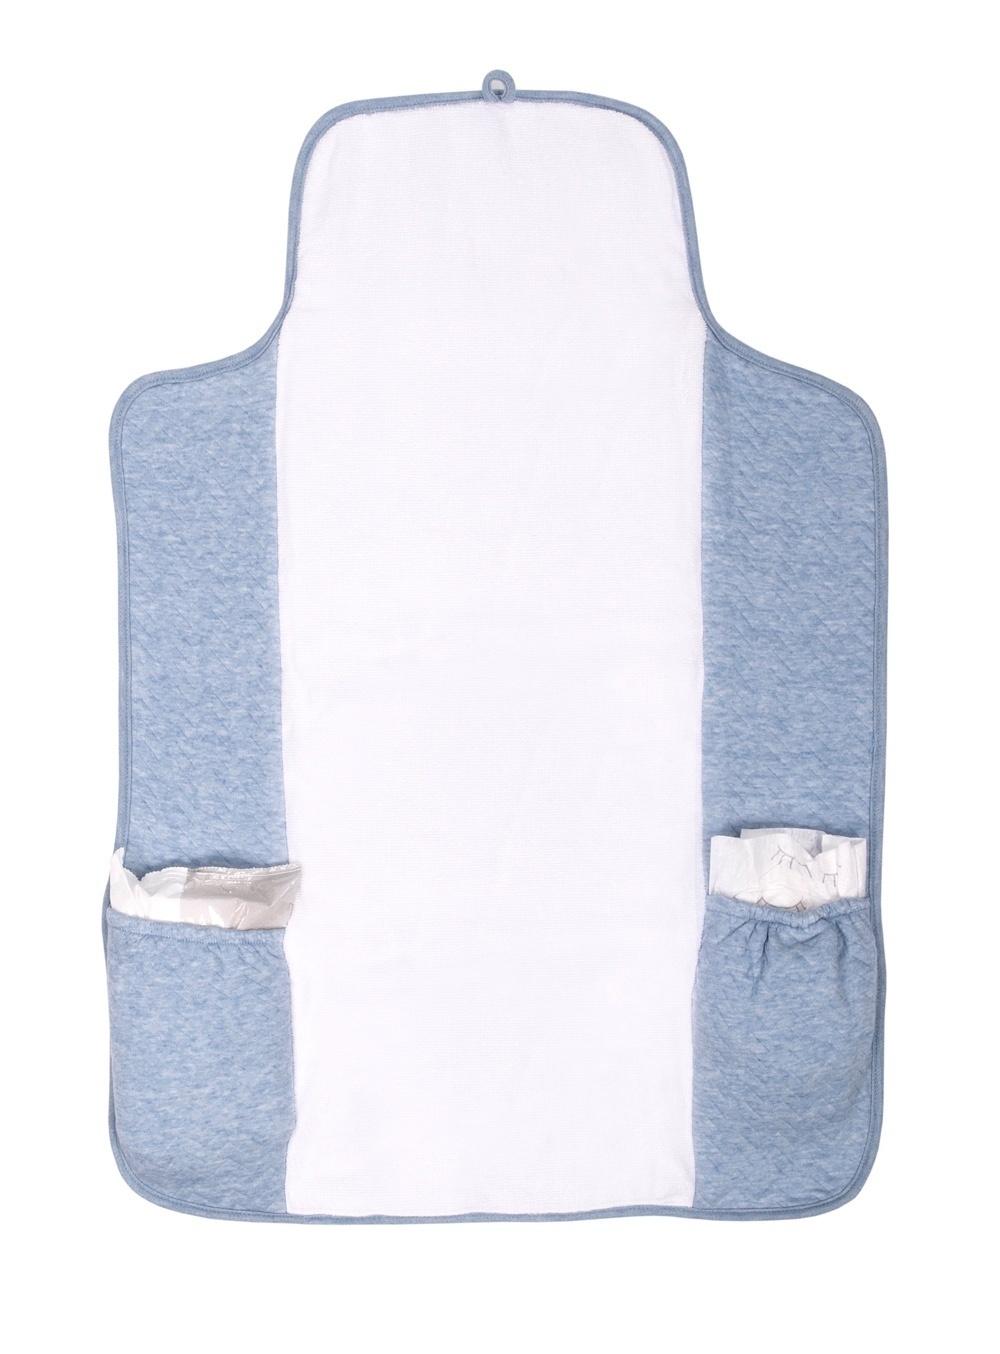 Gift set Chevron Denim Blue with white-8